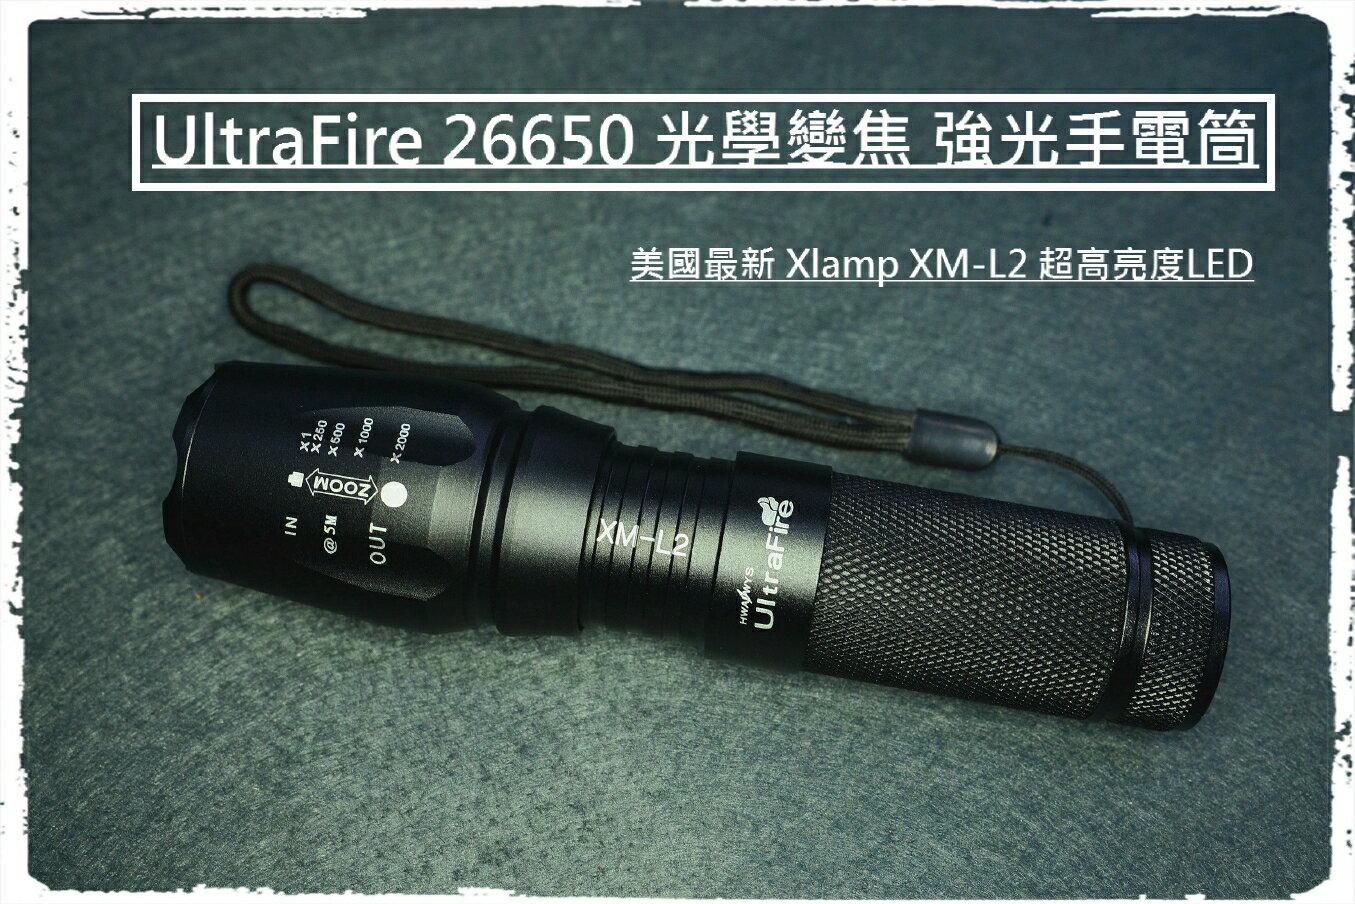 UltraFire XM-L2 LED強光手電筒(26650大容量鋰電池版)神火CREE伸縮調光廣角變焦自行車18650